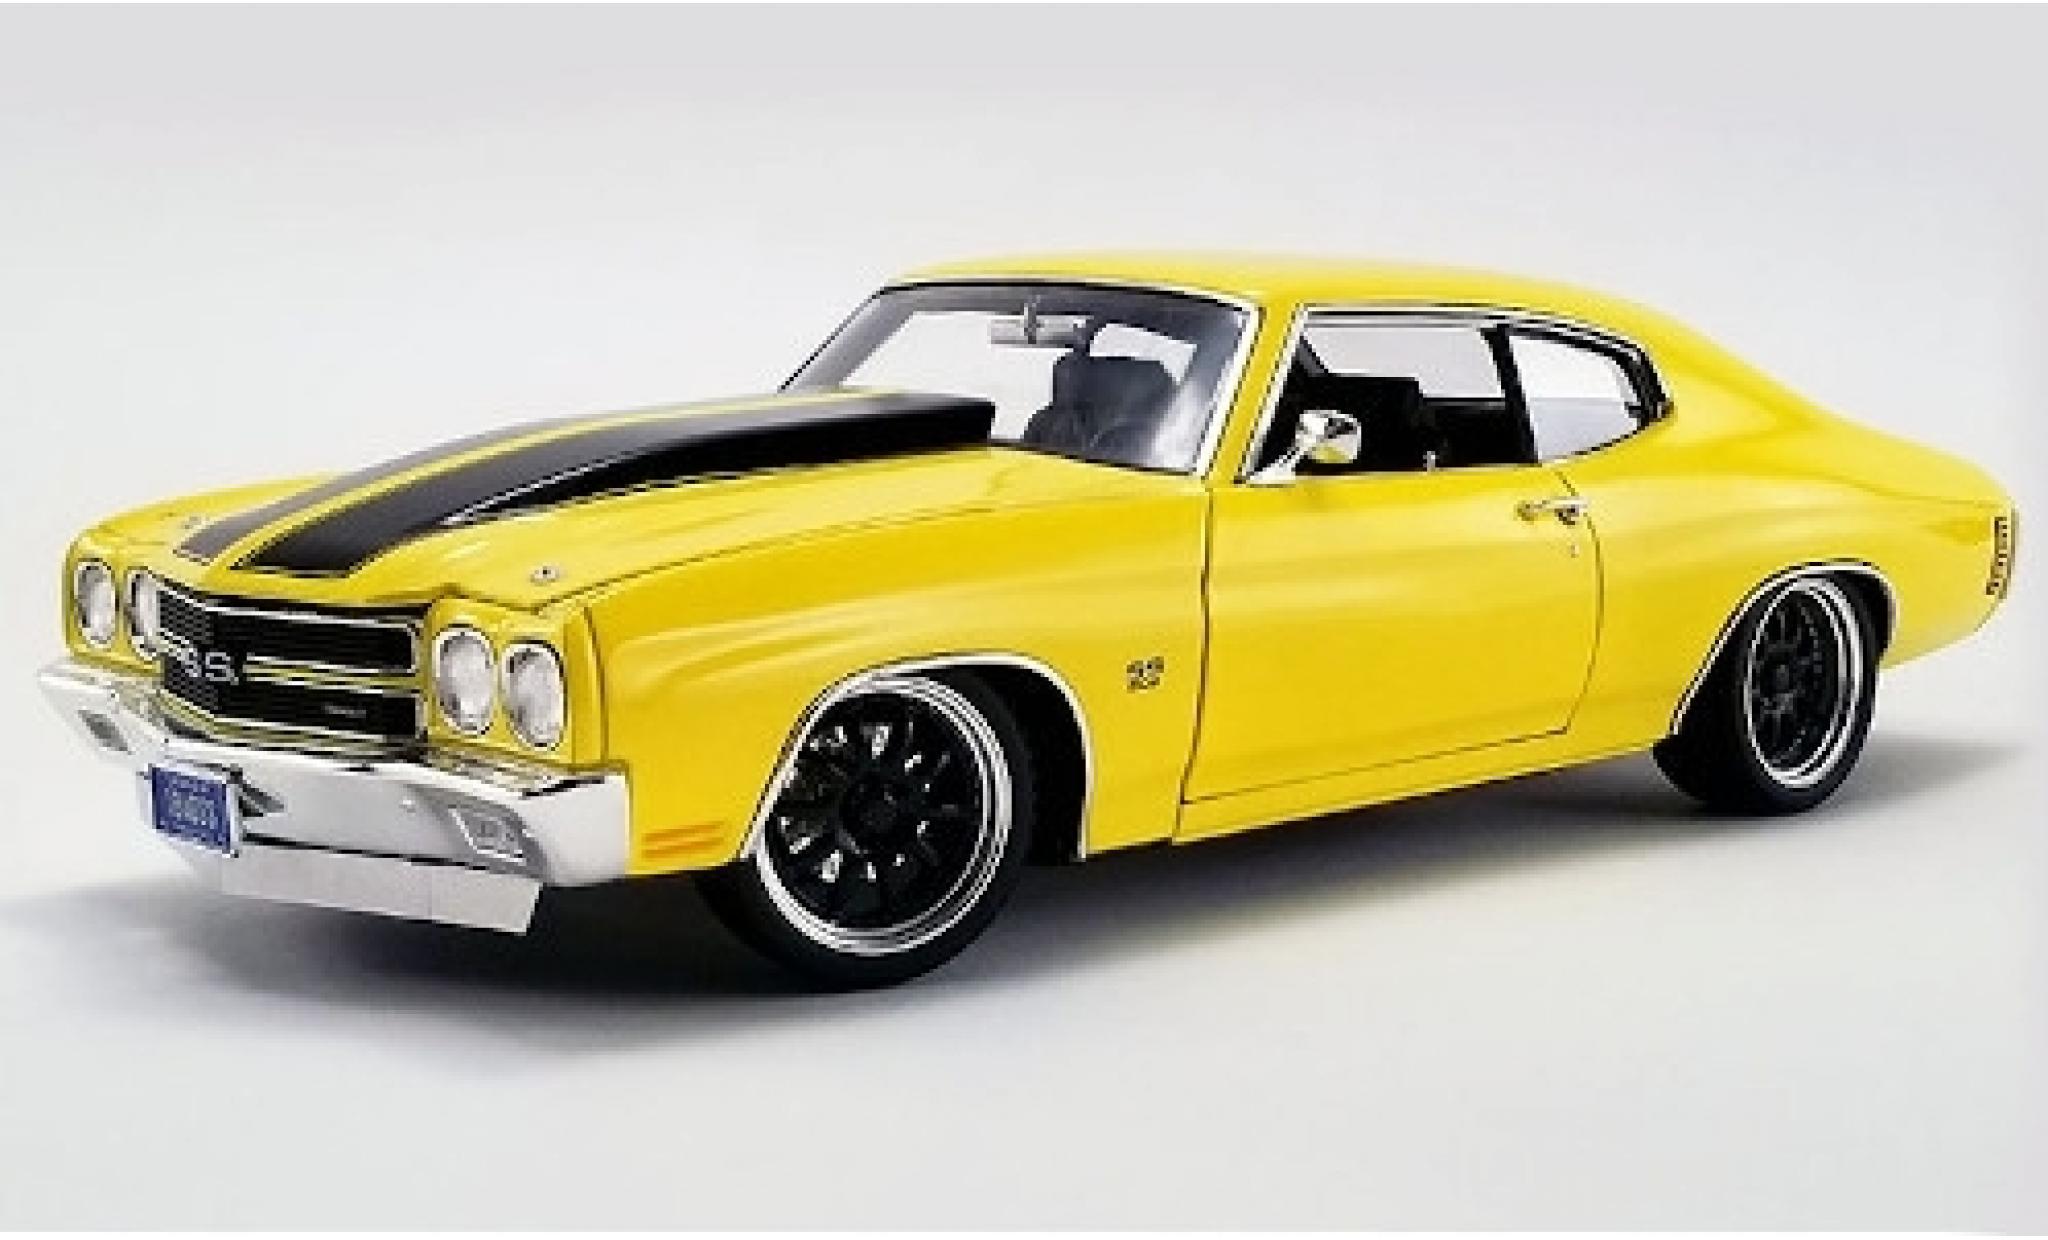 Chevrolet Chevelle 1/18 ACME amarillo/negro 1970 Street Fighter